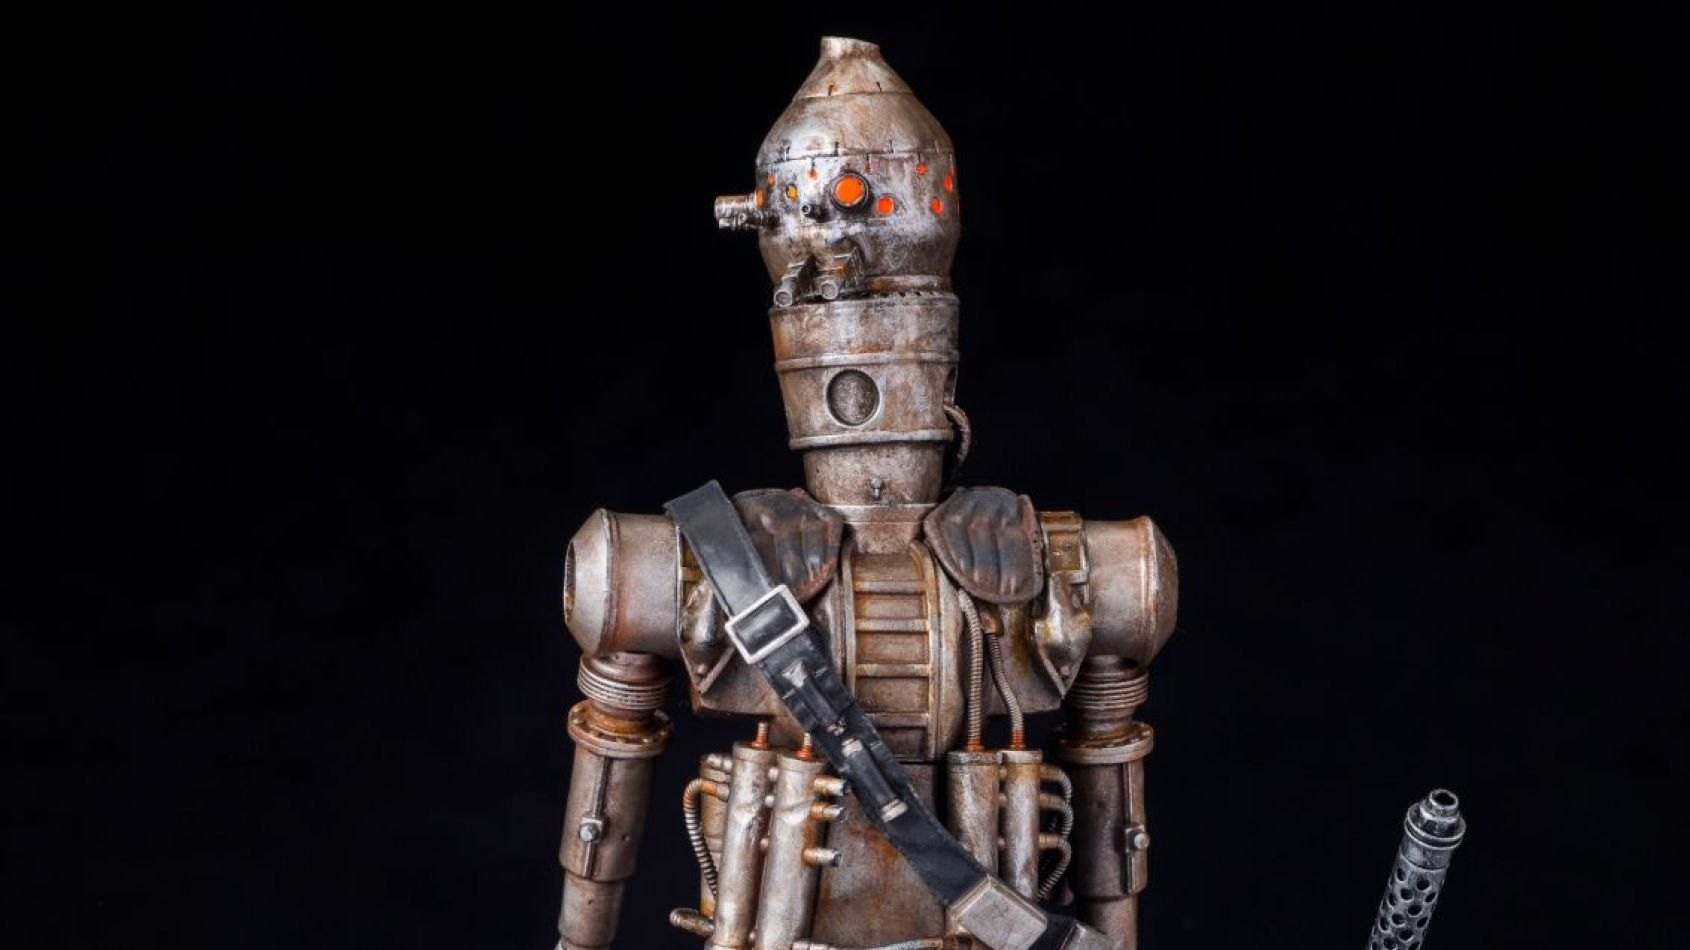 Kotobukiya : Une figurine ARTFX+ pour IG-88